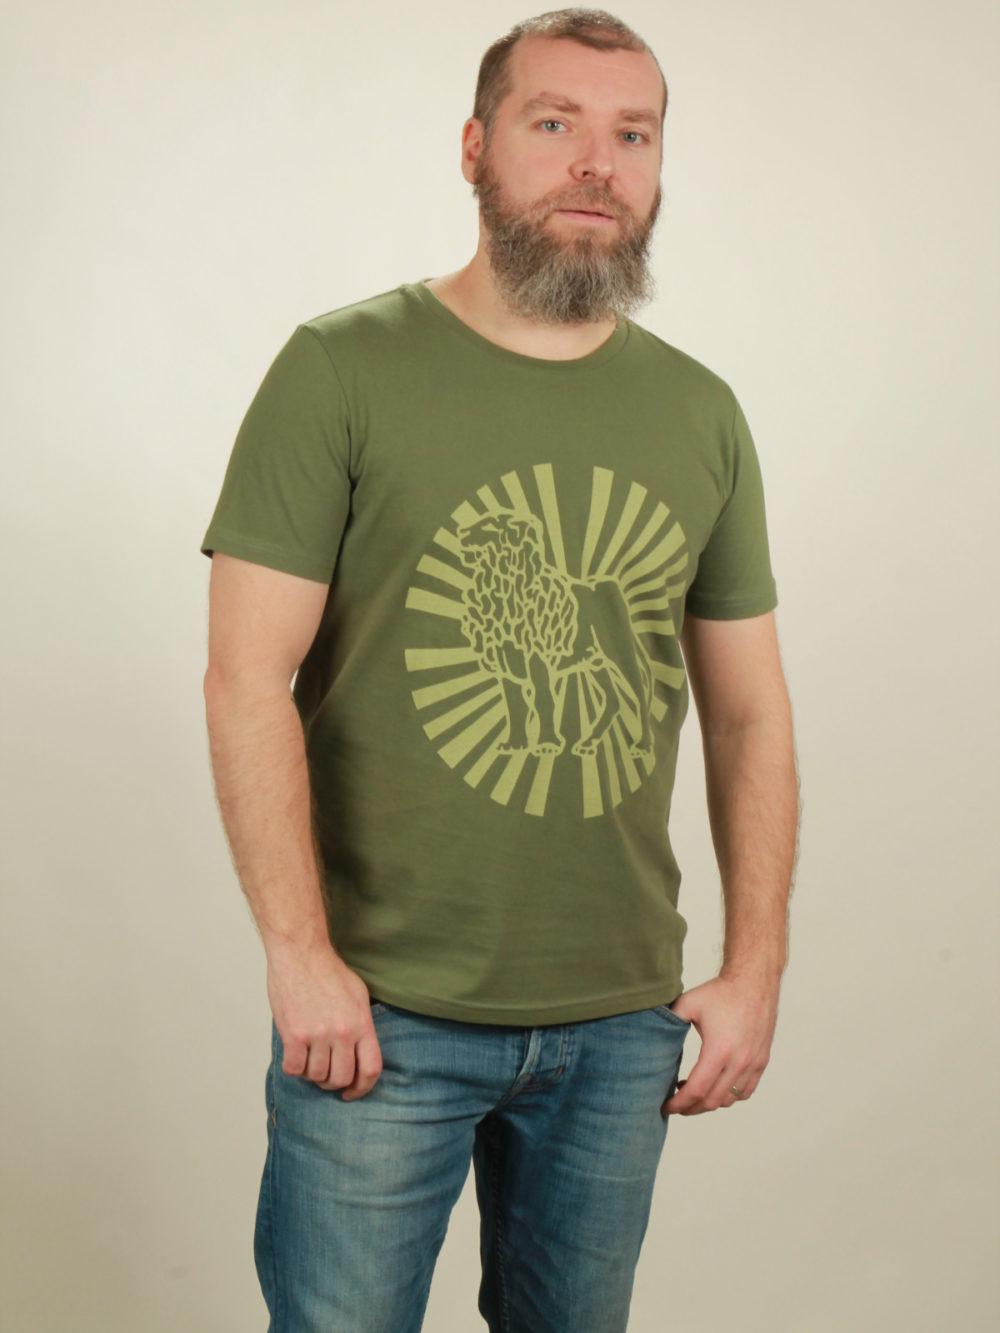 Herren-T-Shirt Lion Sun - green - NATIVE SOULS